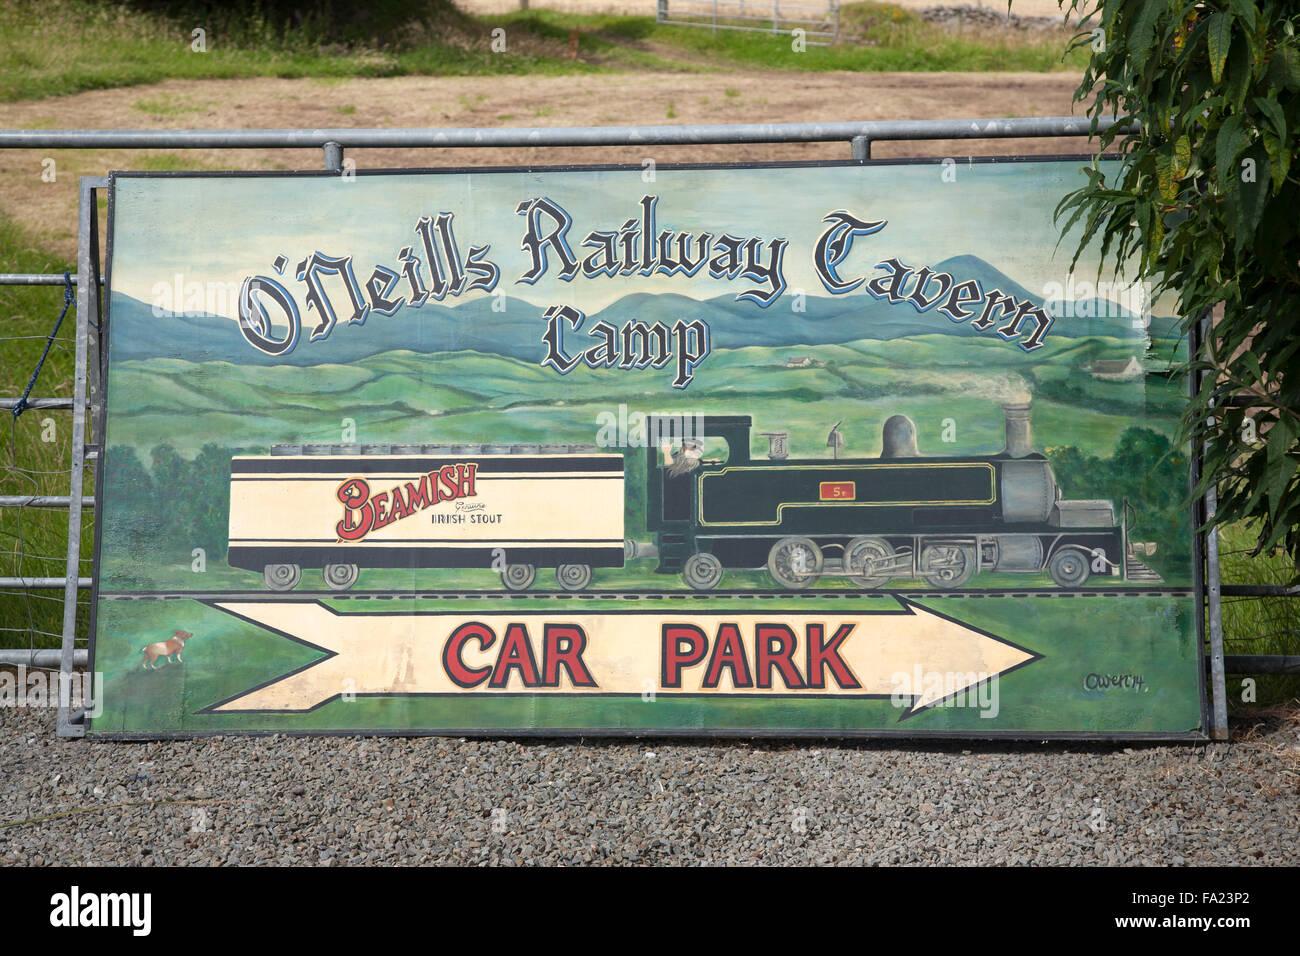 Railway Tavern Pub, Camp, Dingle Peninsula; Ireland - Stock Image